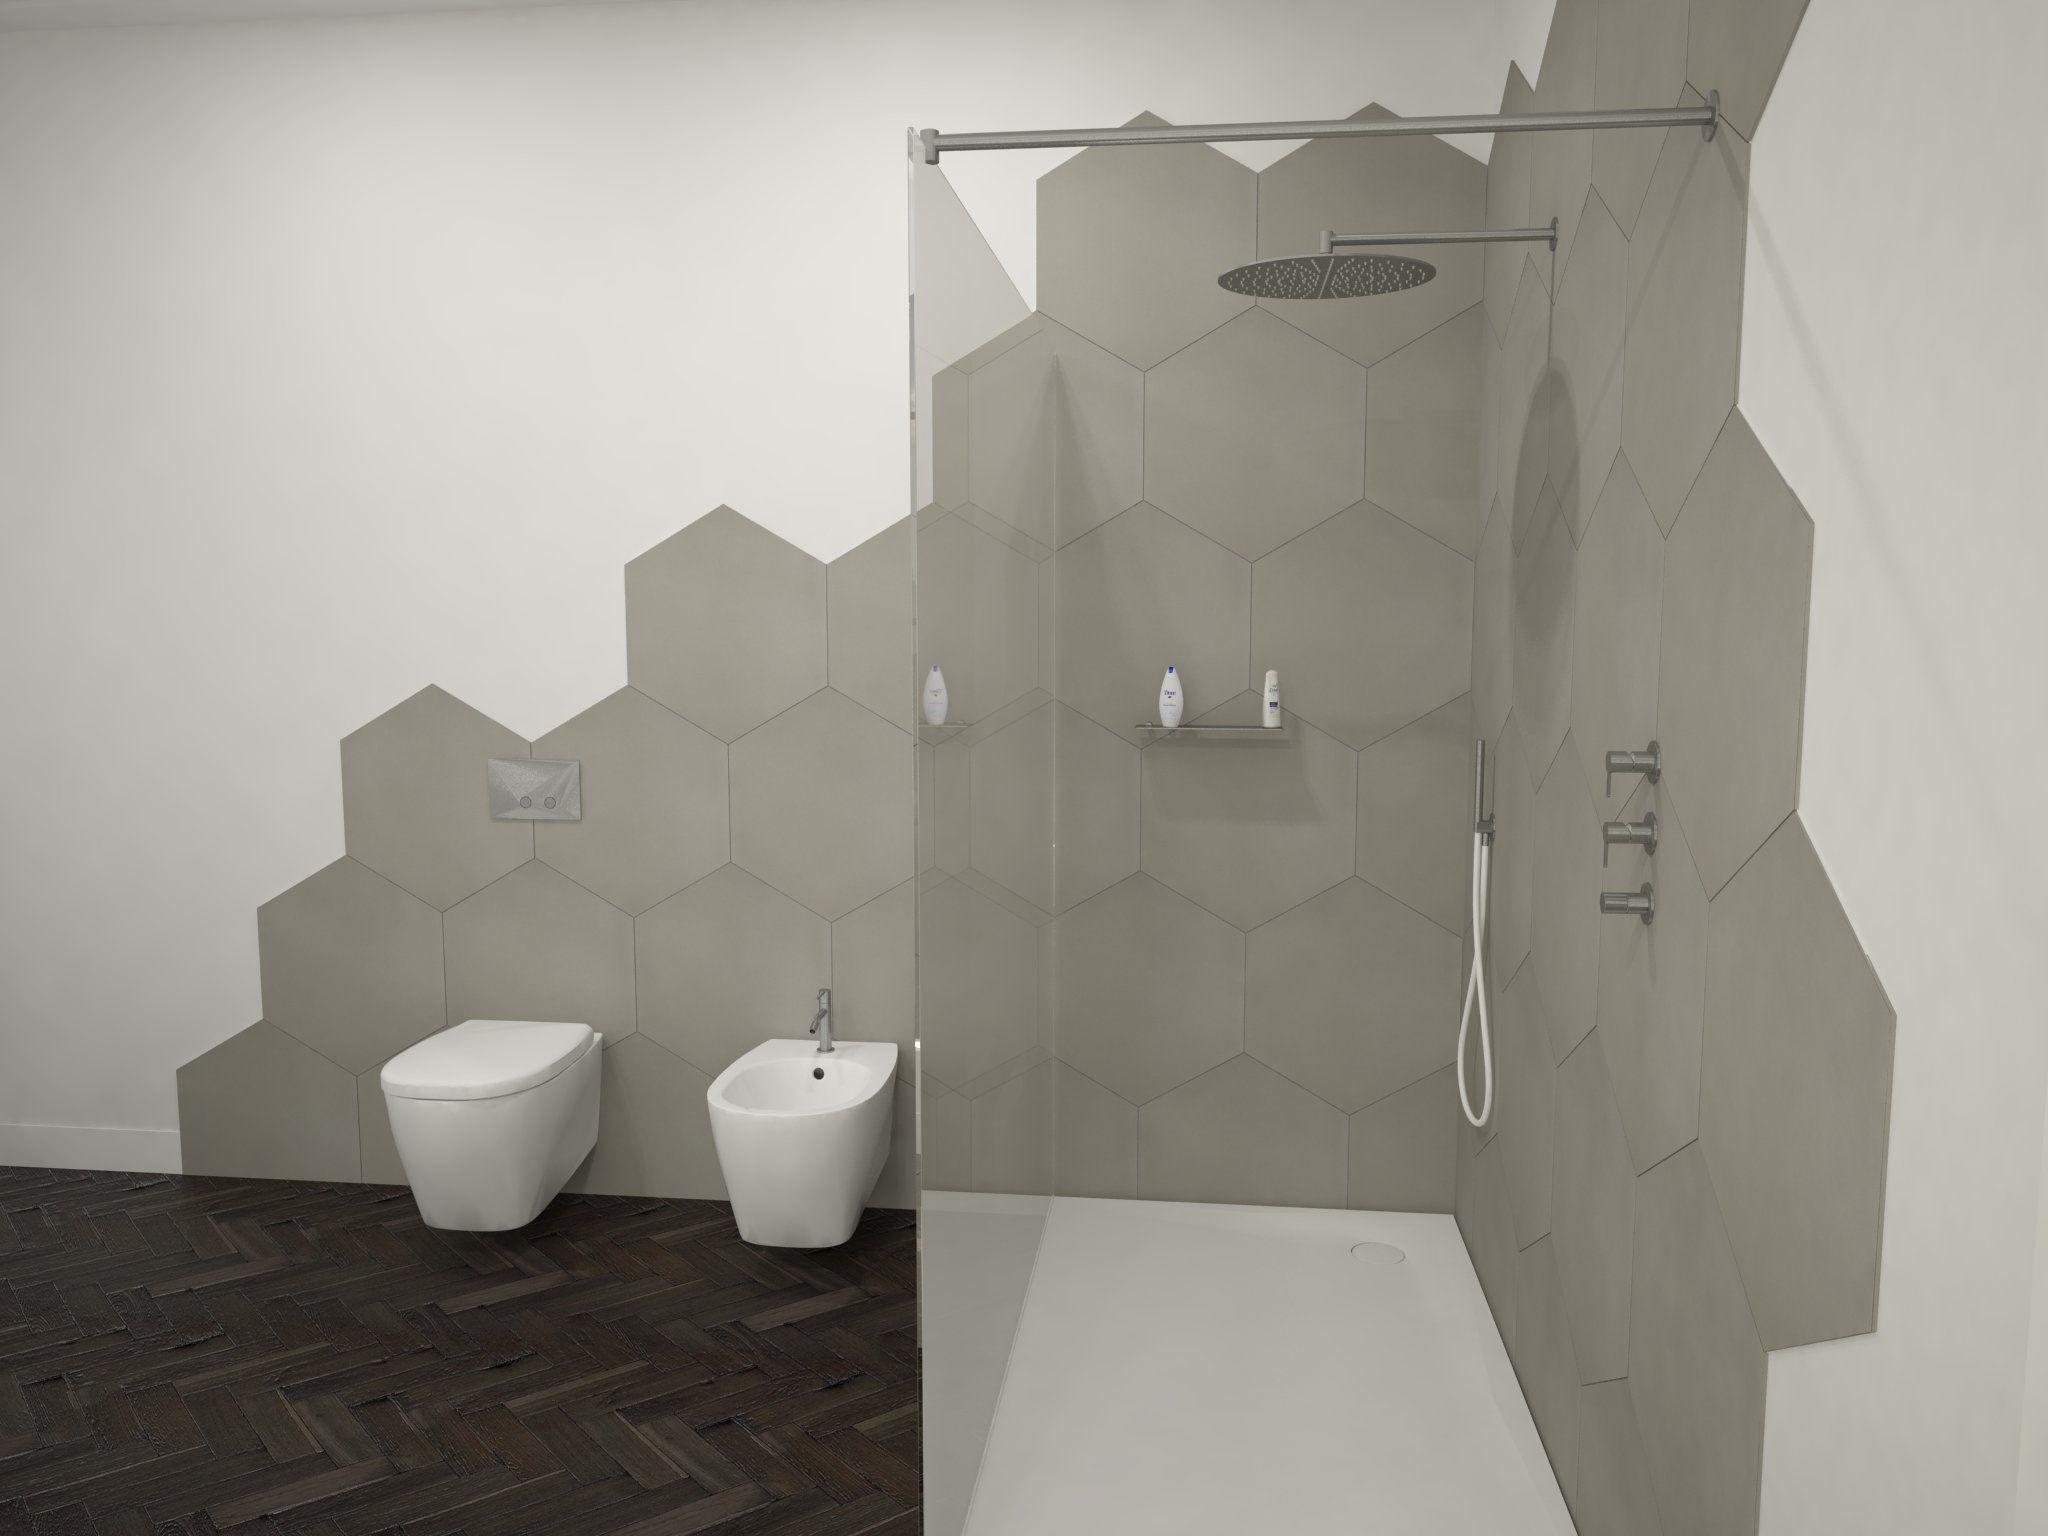 Design Badkamer Rotterdam : Badkamer rotterdam met rexa cea design en mutina bathrooms